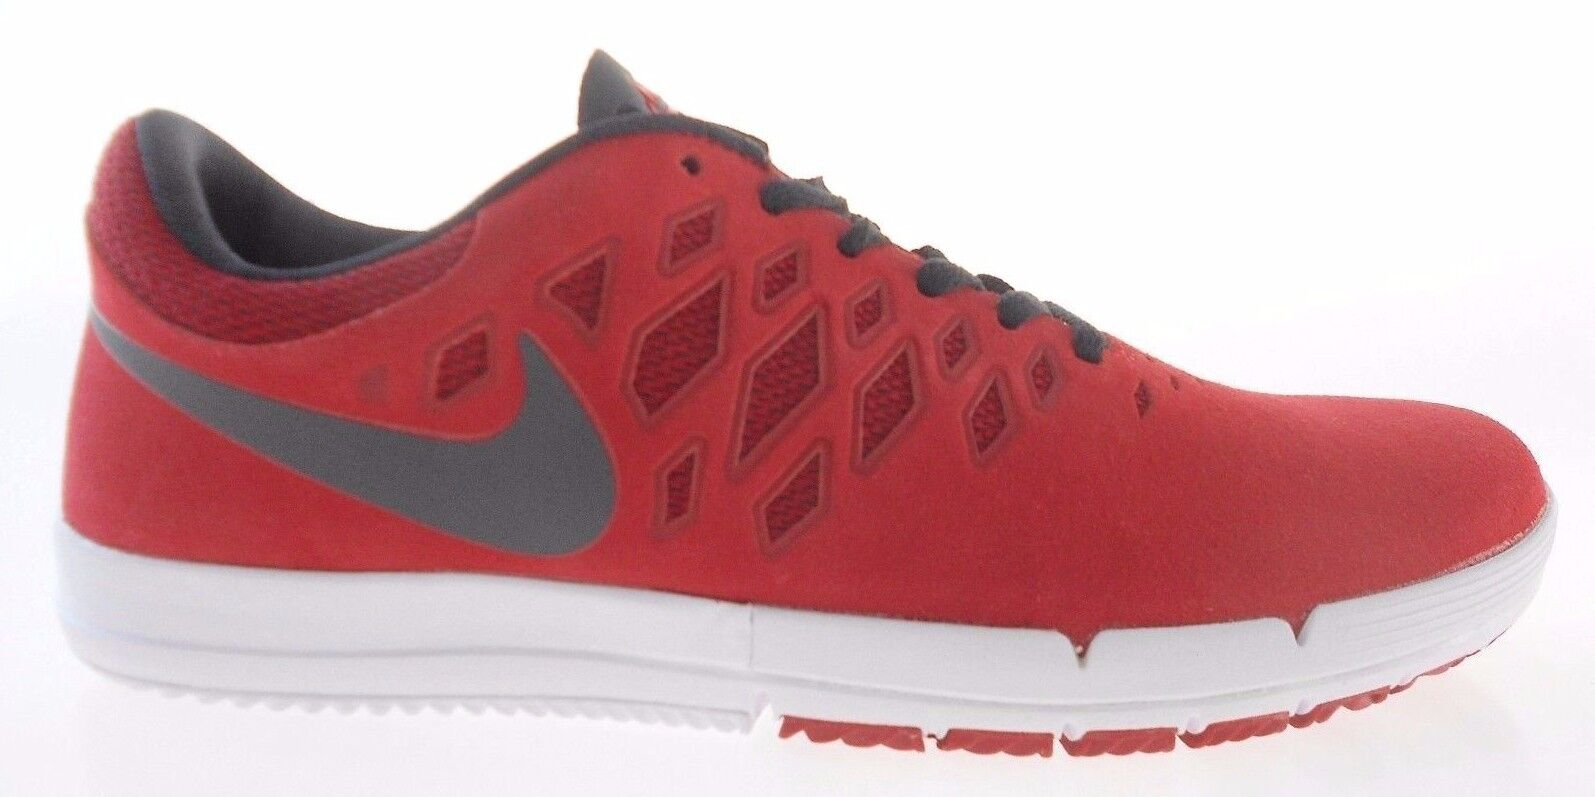 nike free sb männer sneaker, rot - schwarzen sneaker, männer 120.00 39d605